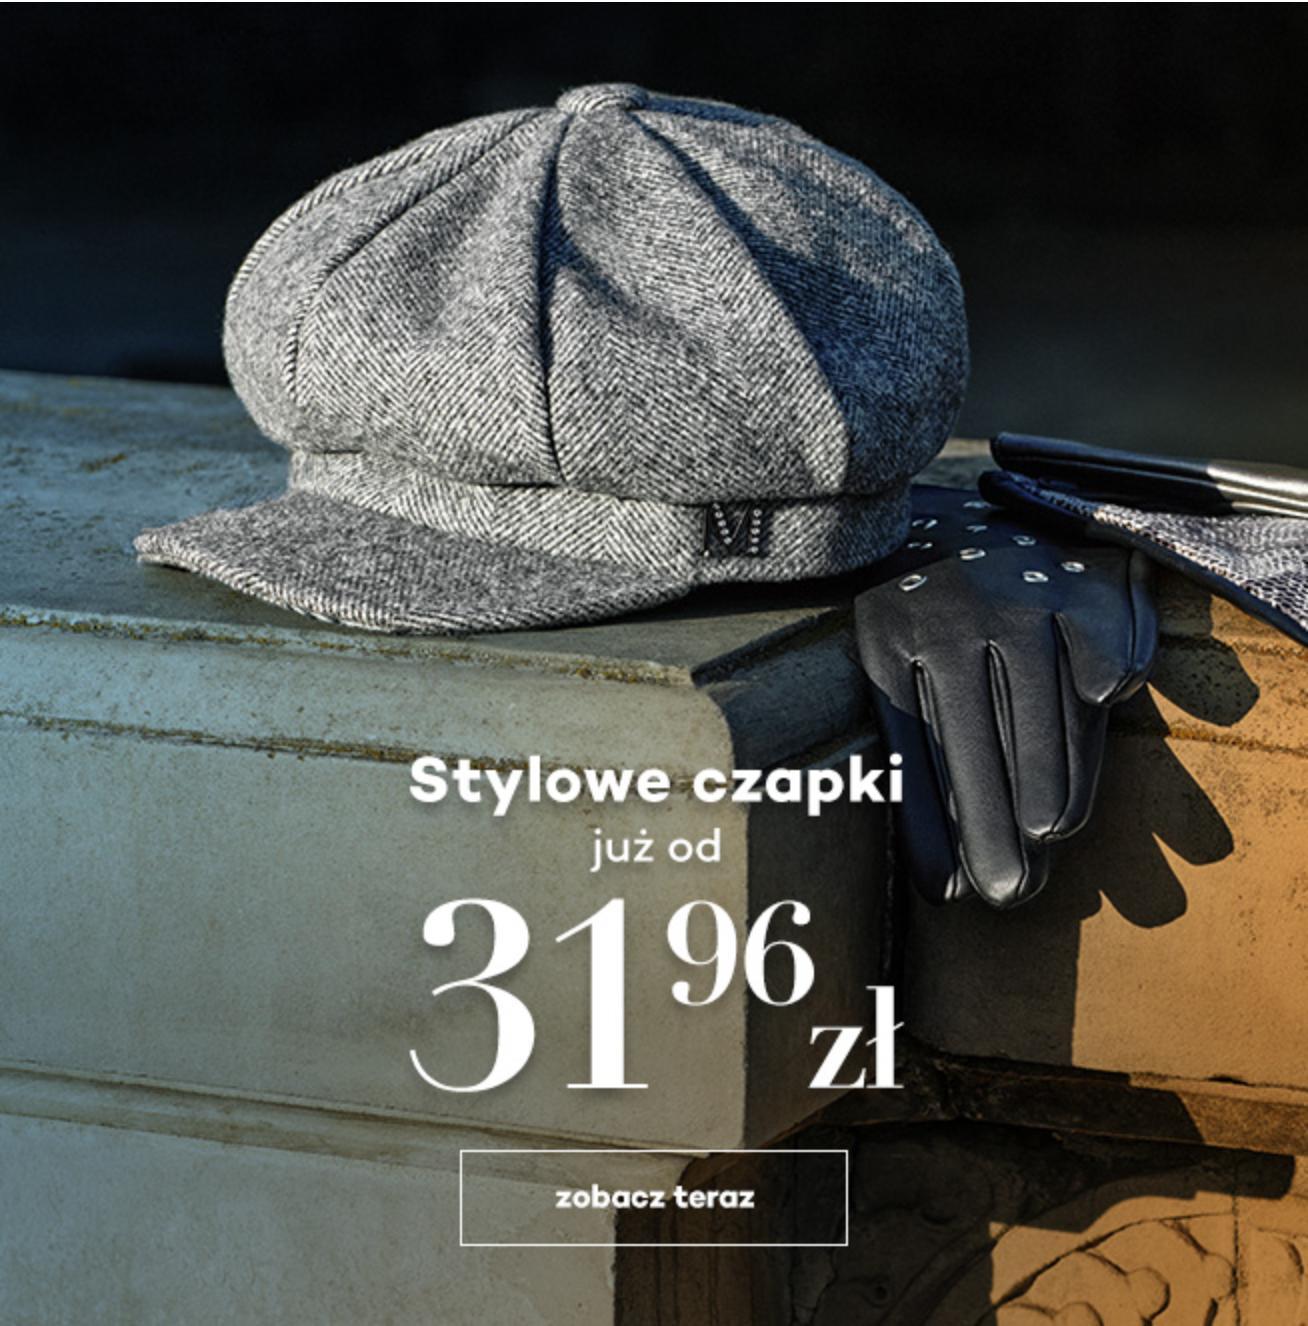 Monnari Monnari: stylowe czapki już od 31,96 zł